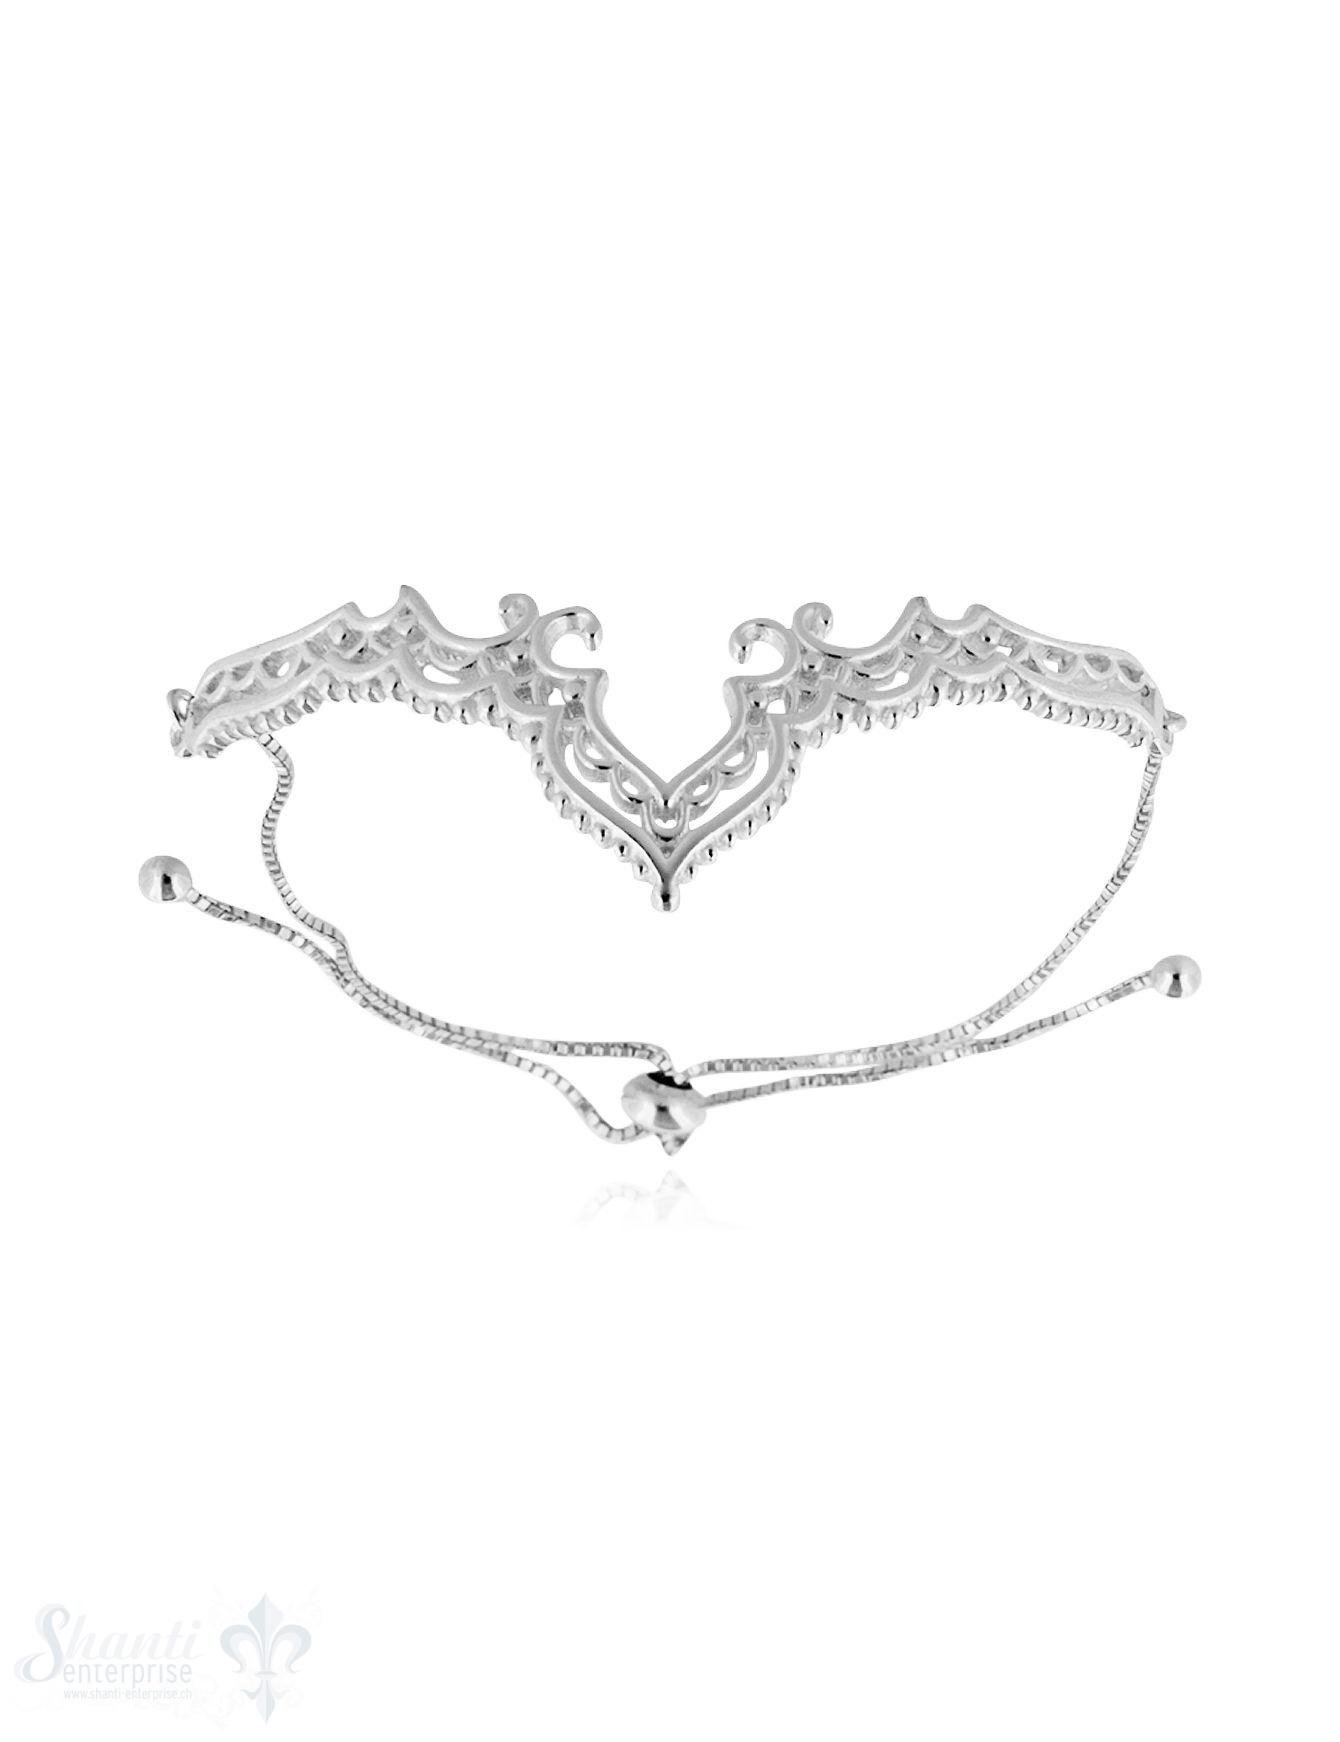 Armkette Silber hell Diadem filigran